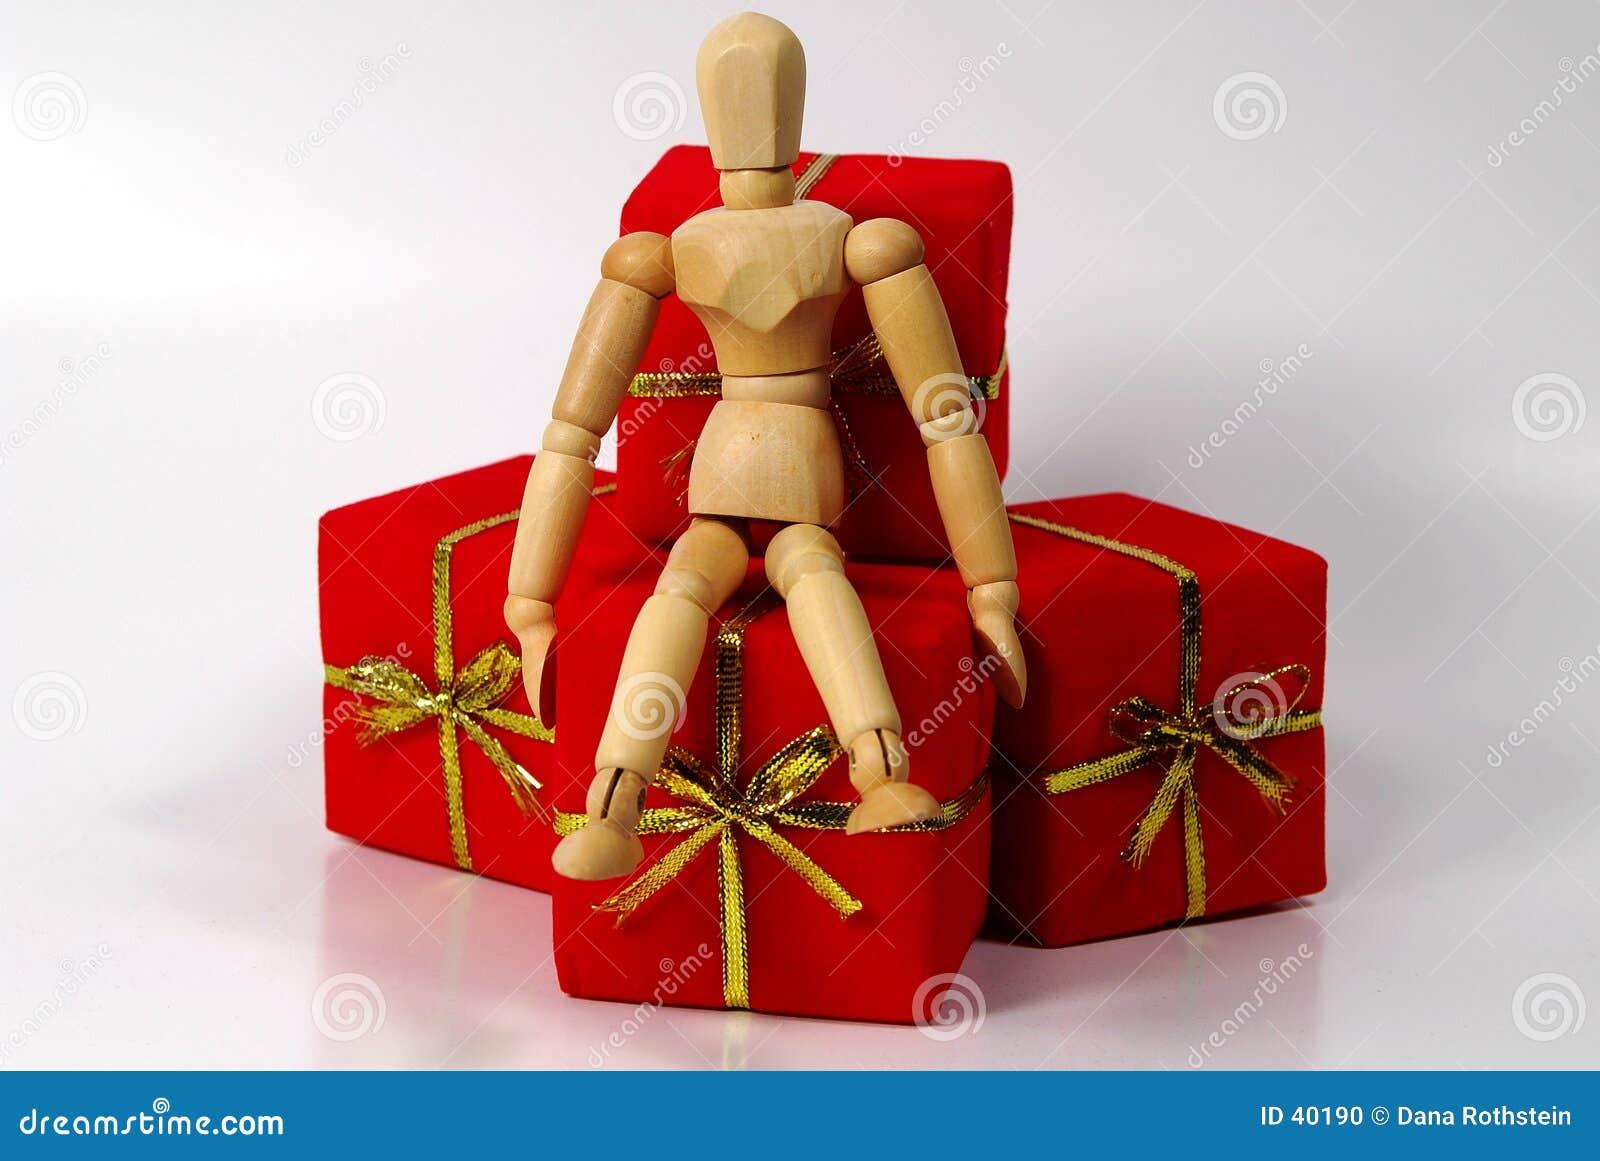 манекен подарков